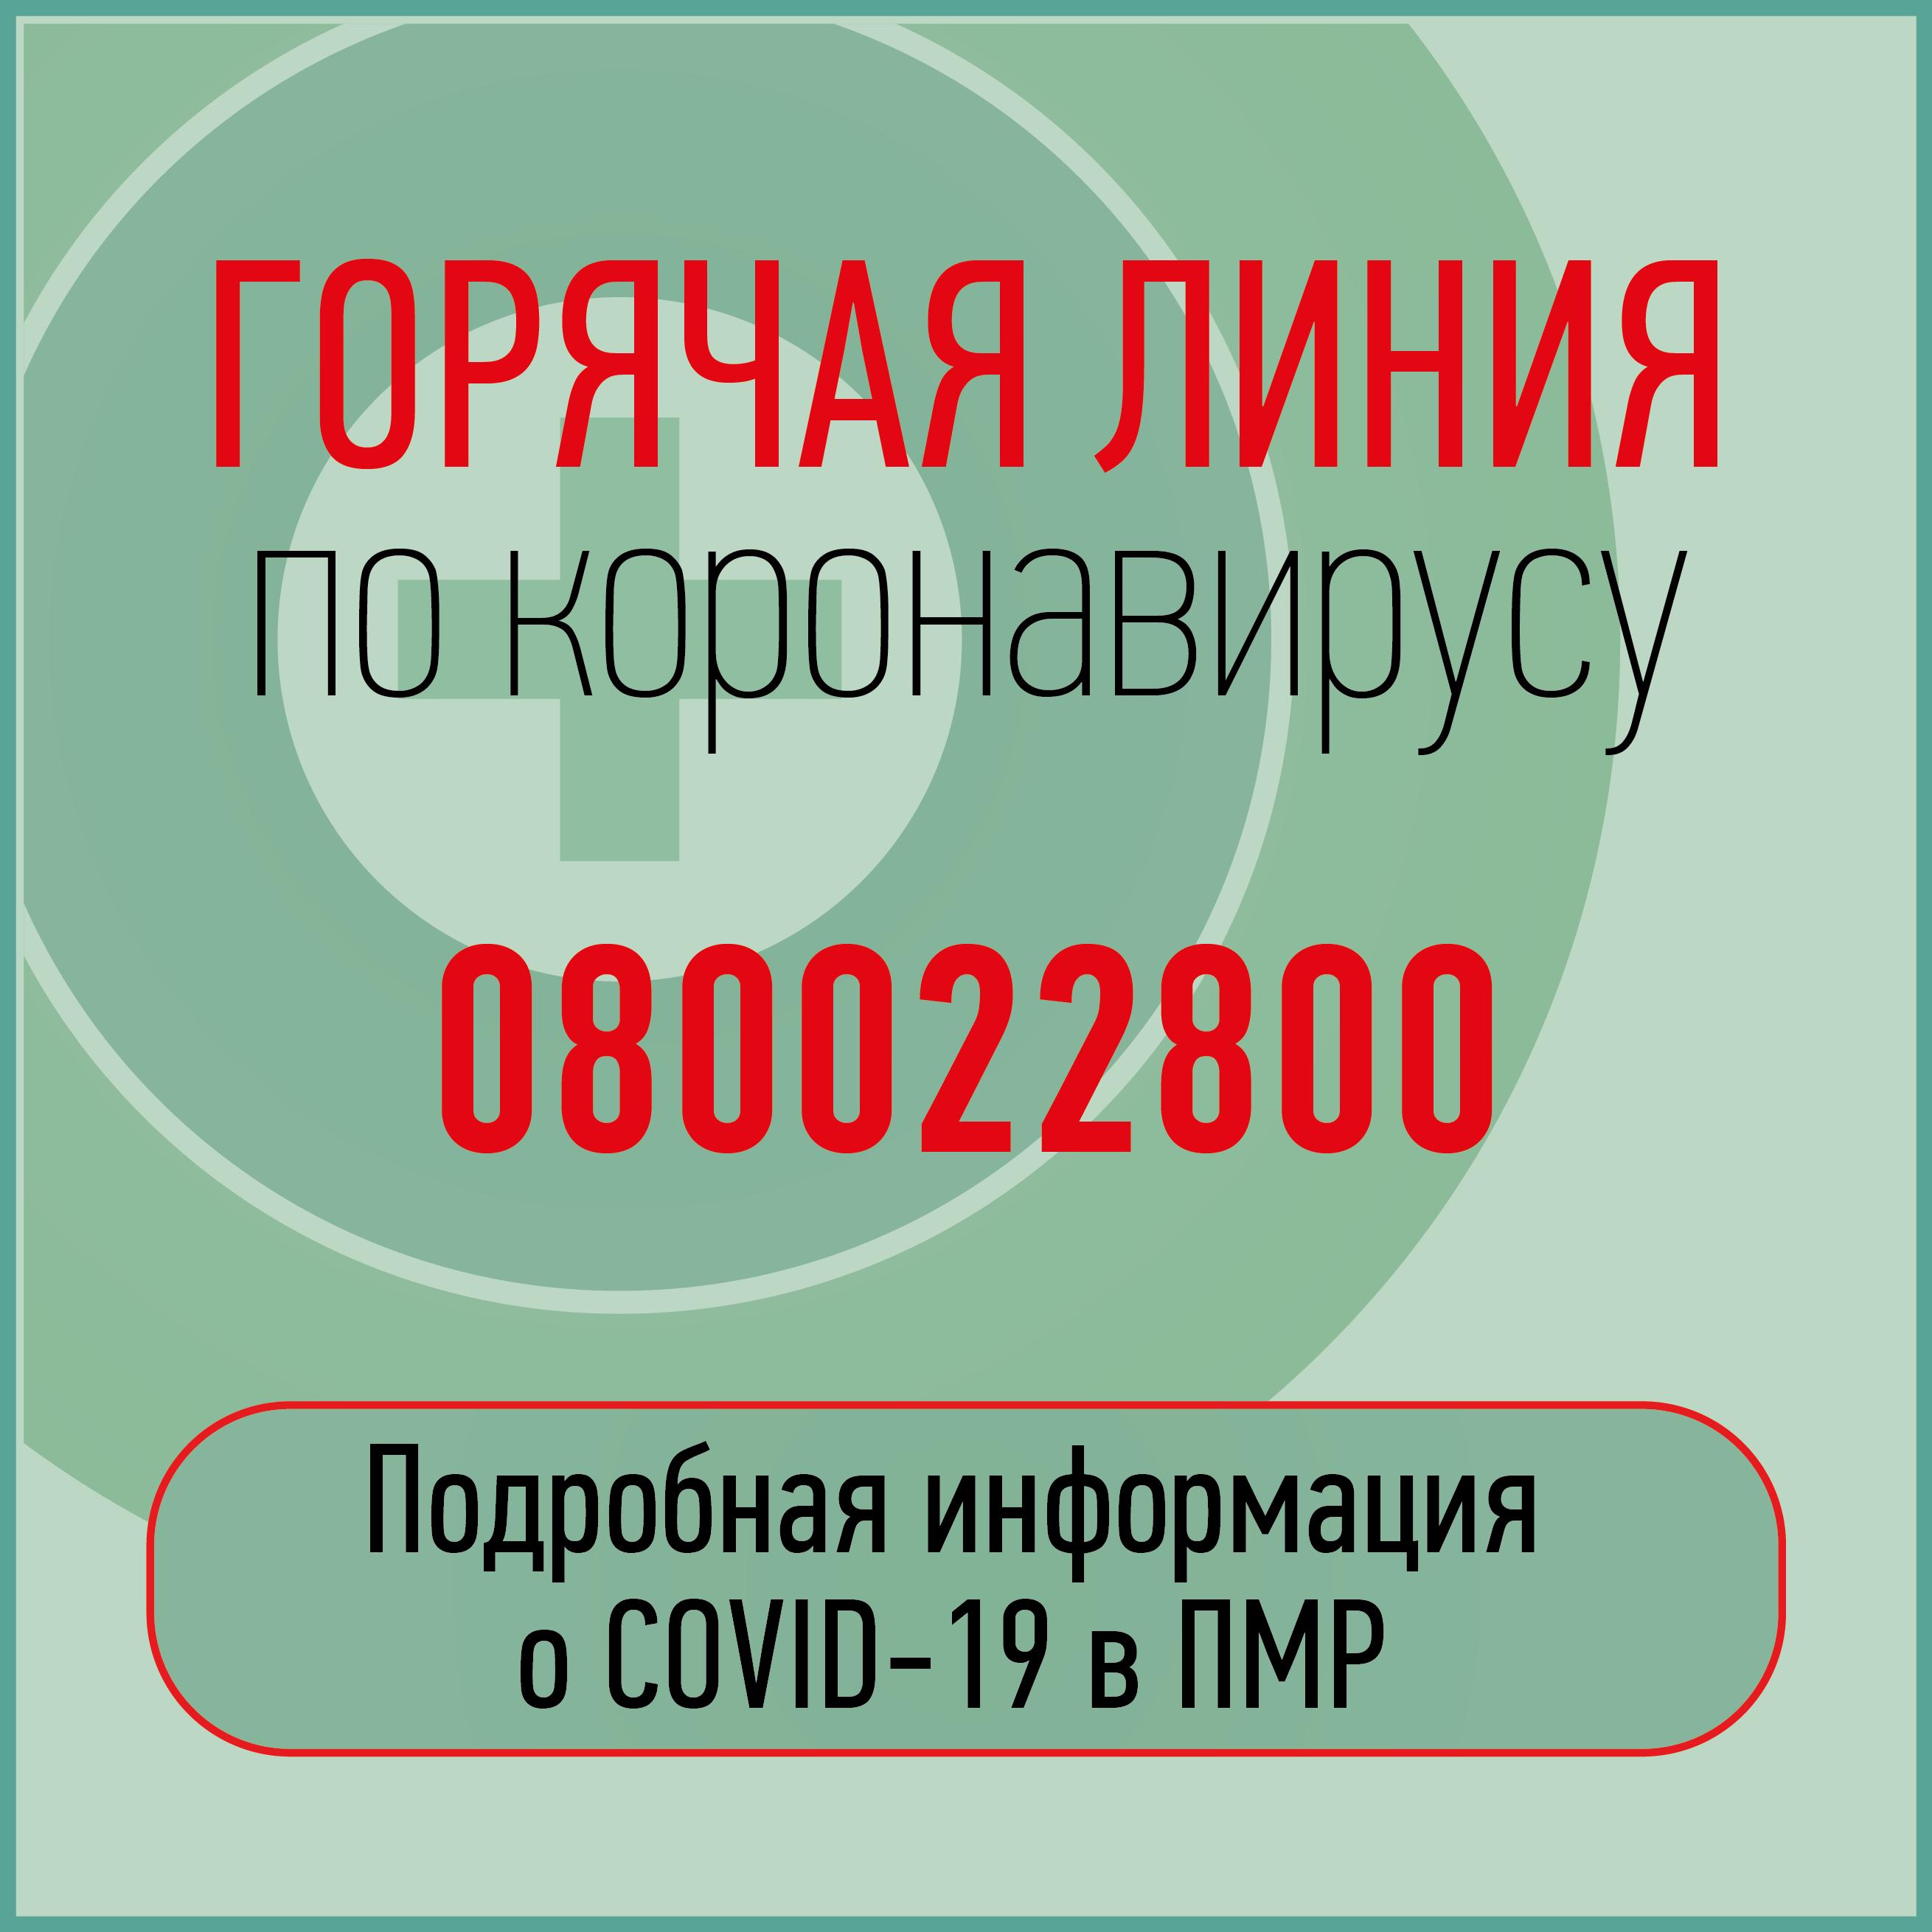 Коронавирус COVID-19 ПМР